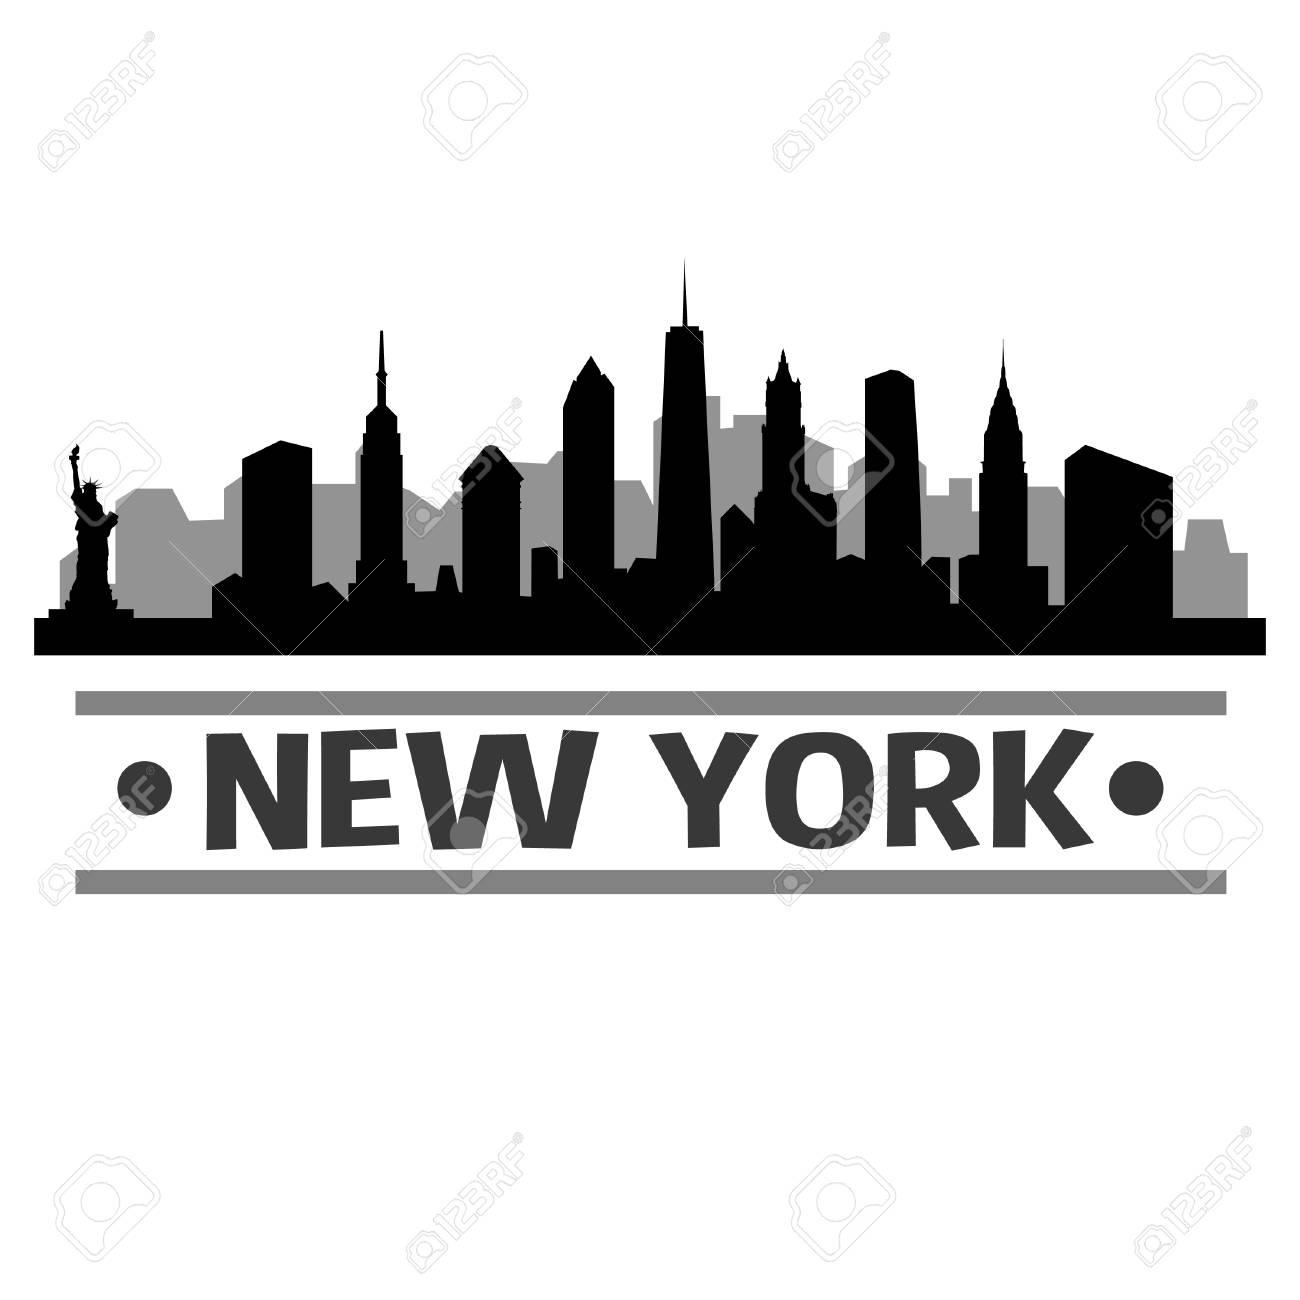 New York Skyline Vector Art City Design Royalty Free Cliparts